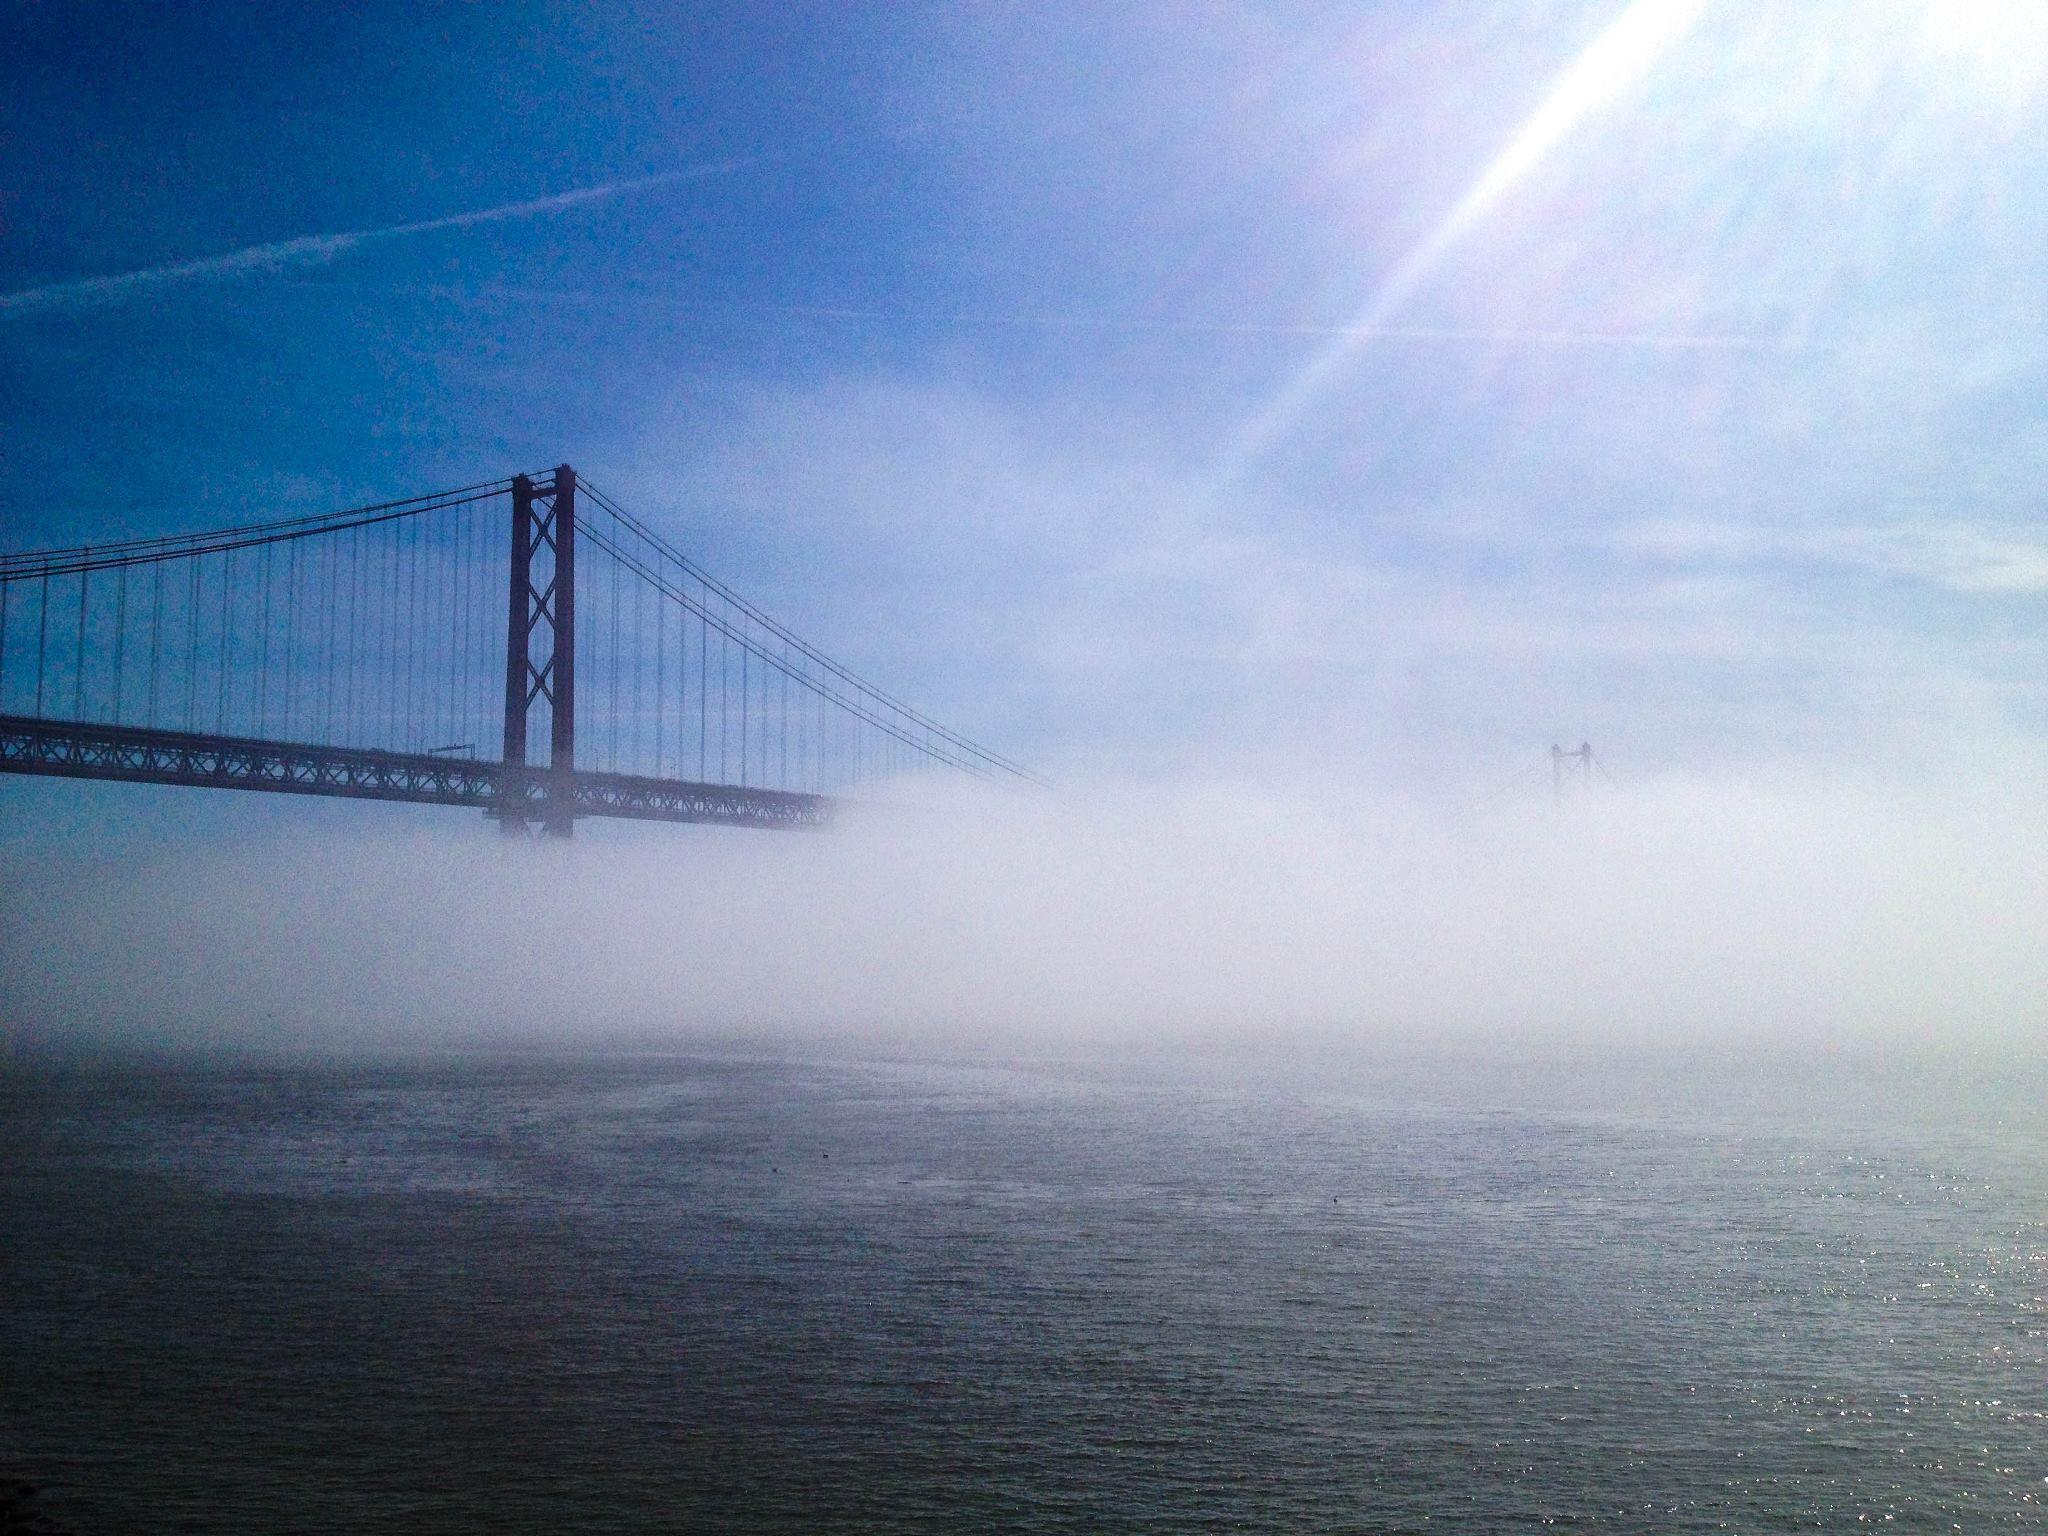 Lisboa 15 de Fevereiro de 2013